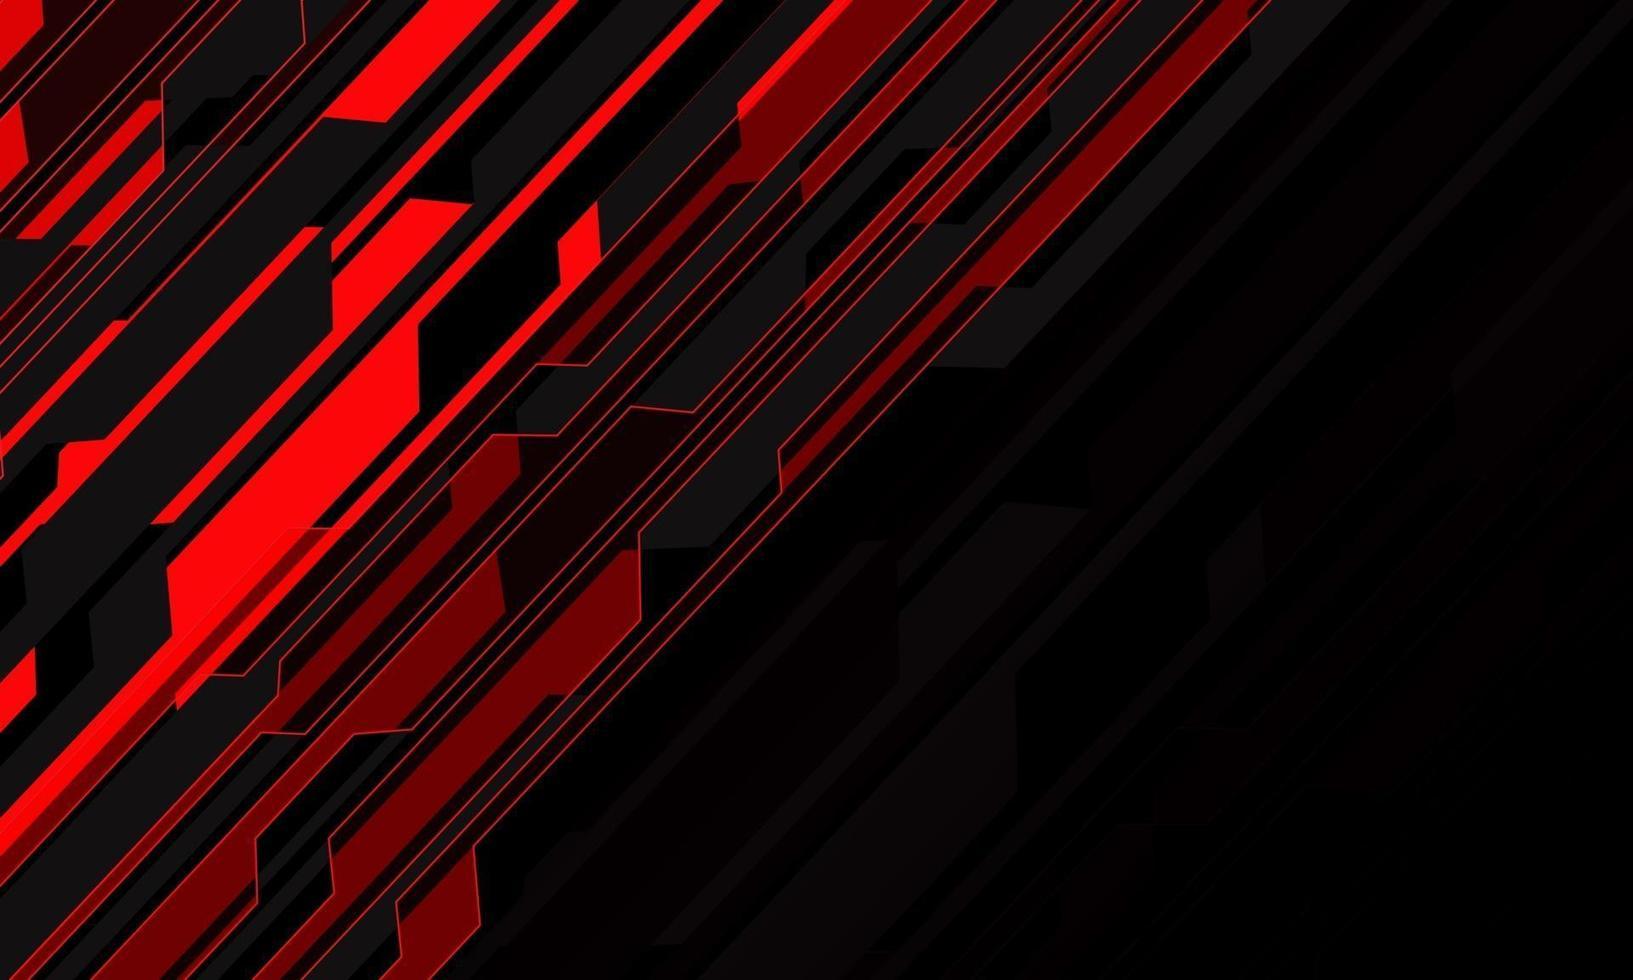 abstrakt rött ljus krets cyber snedstreck på svart tomt utrymme design modern futuristisk teknik bakgrund vektorillustration. vektor